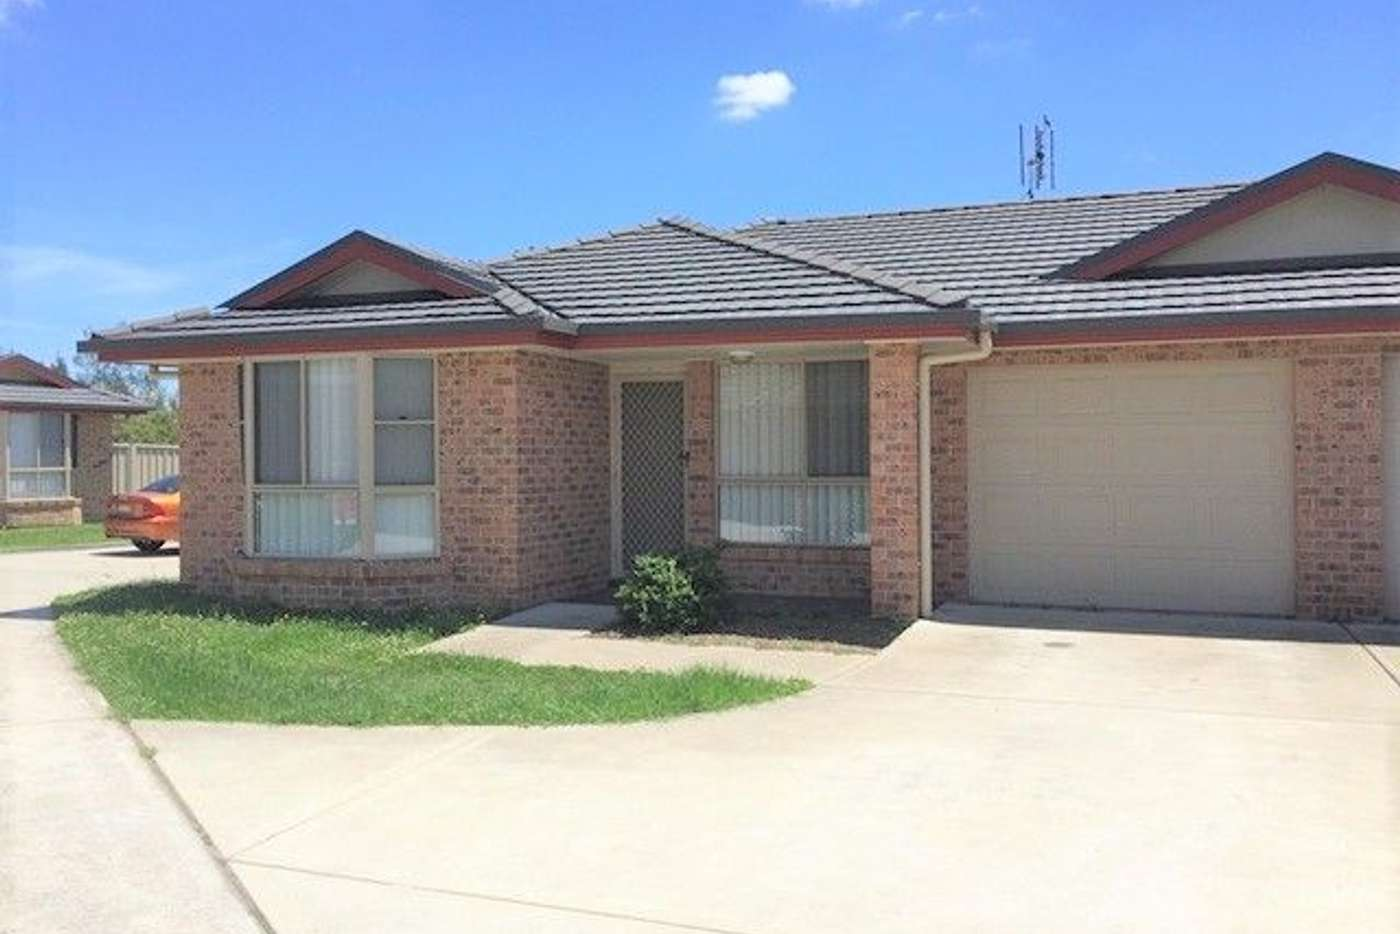 Main view of Homely semiDetached listing, 5/4 Wyndham Street, Greta NSW 2334